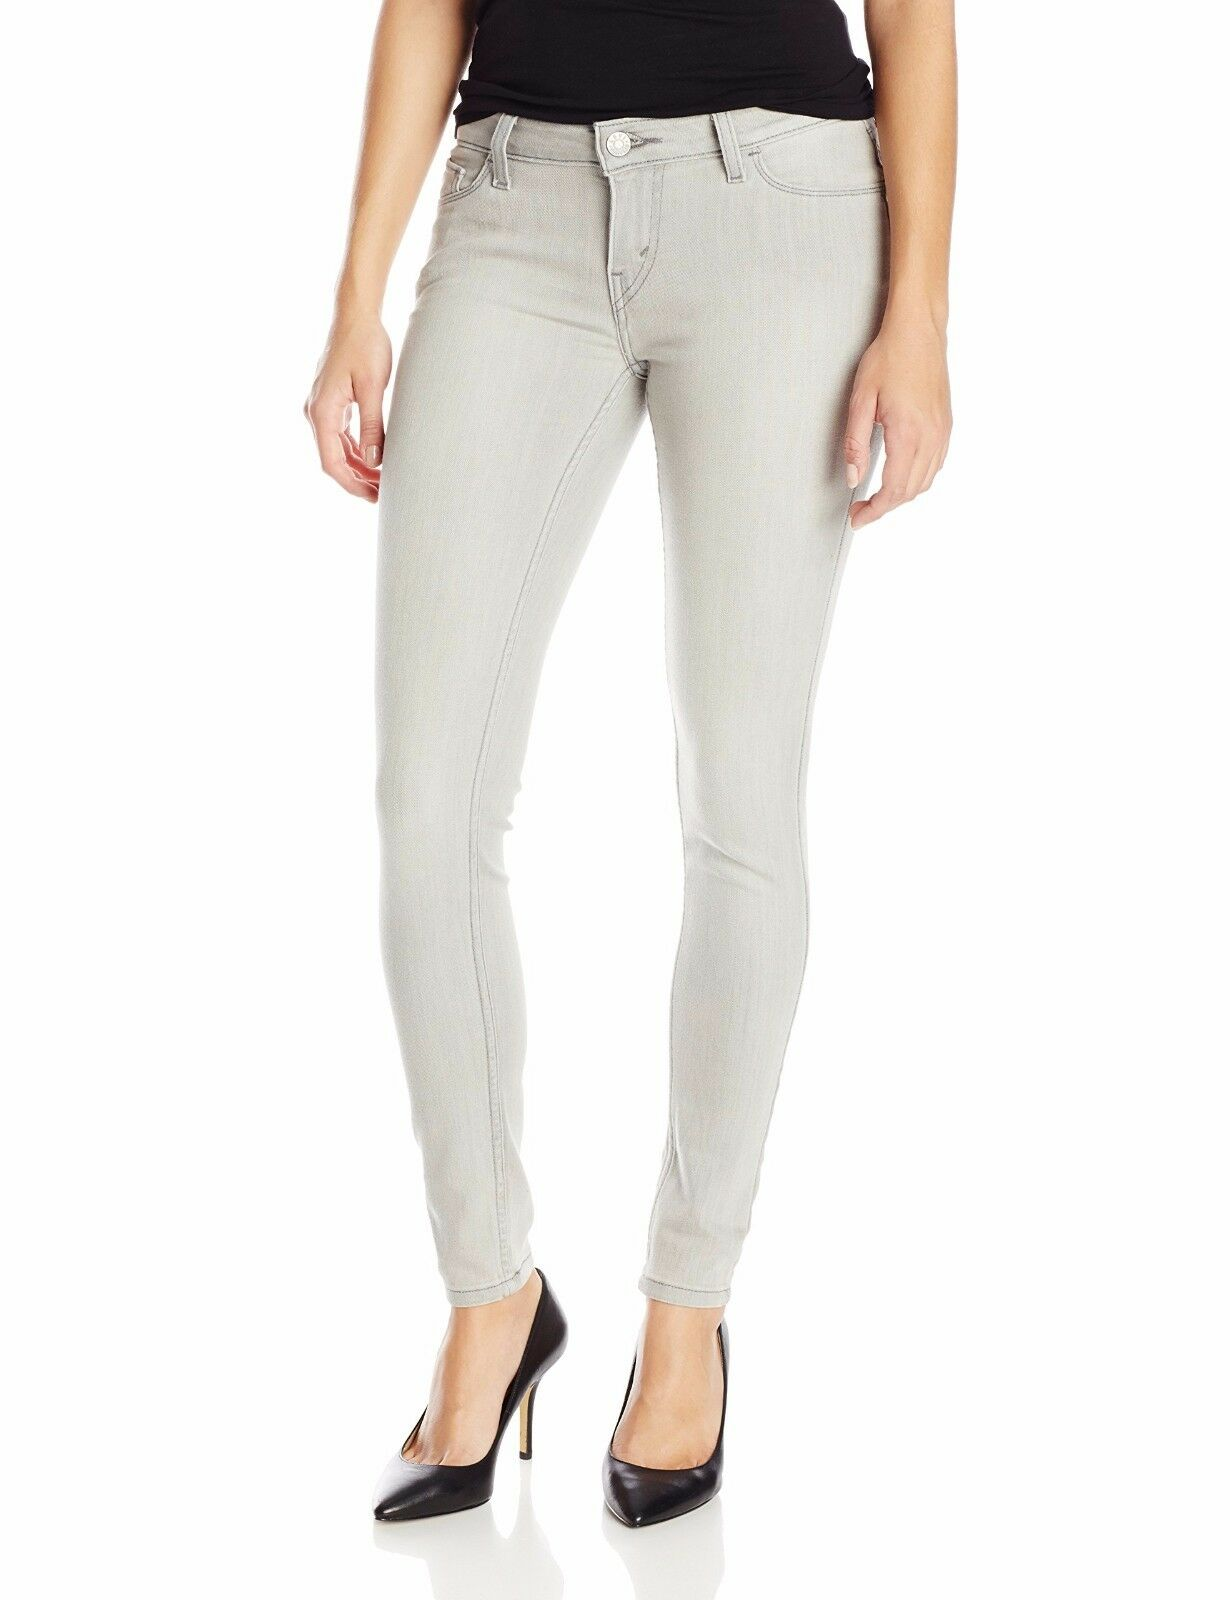 Levi's womens 535 super skinny legging jeans